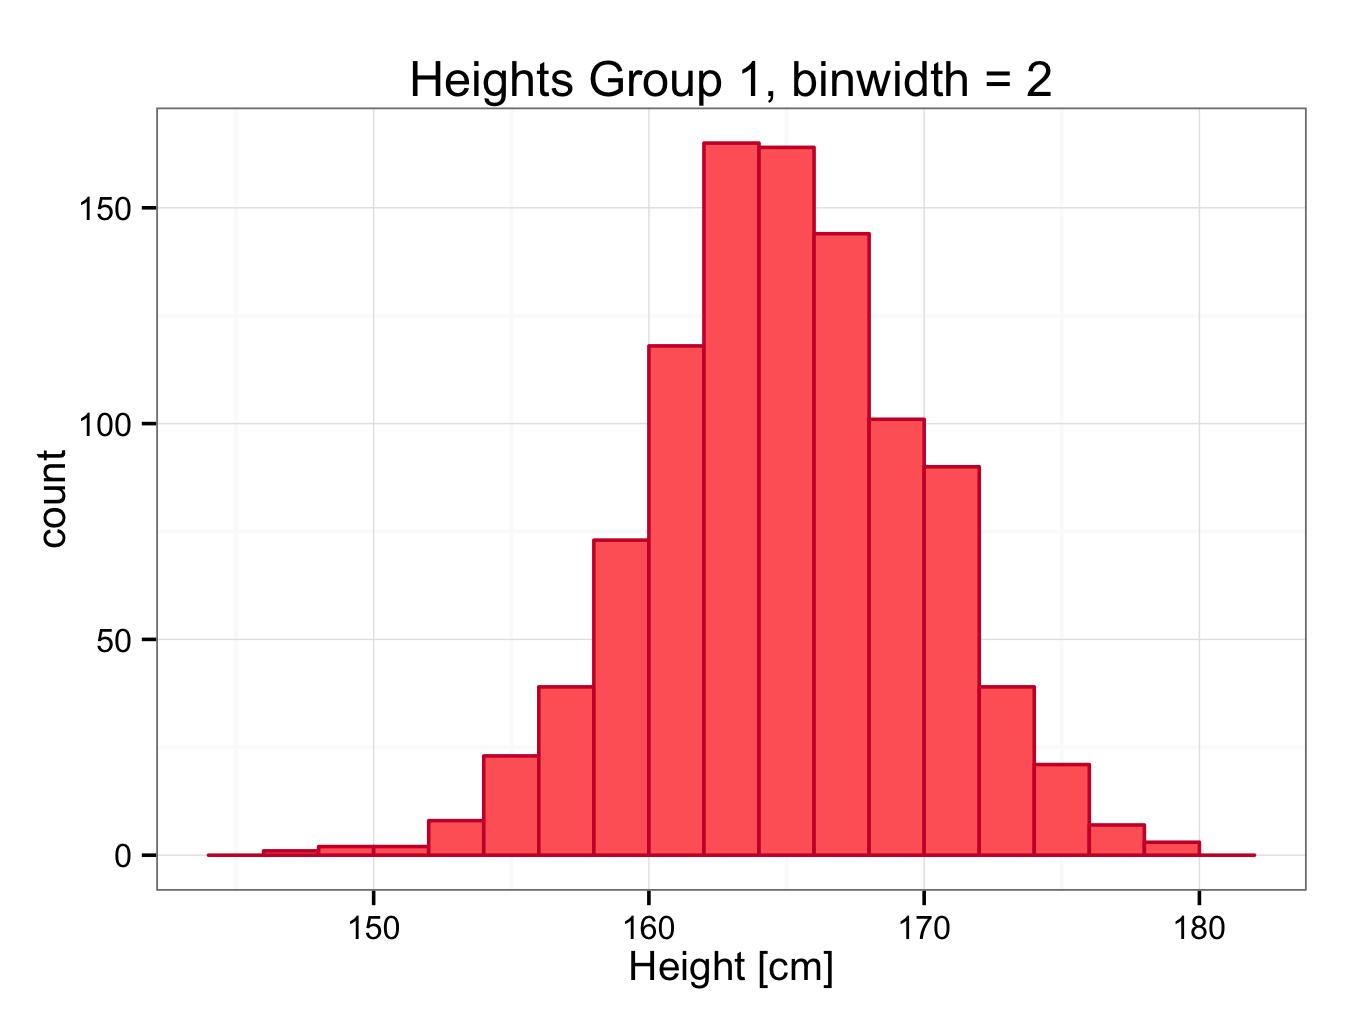 heightsgroup1bin2